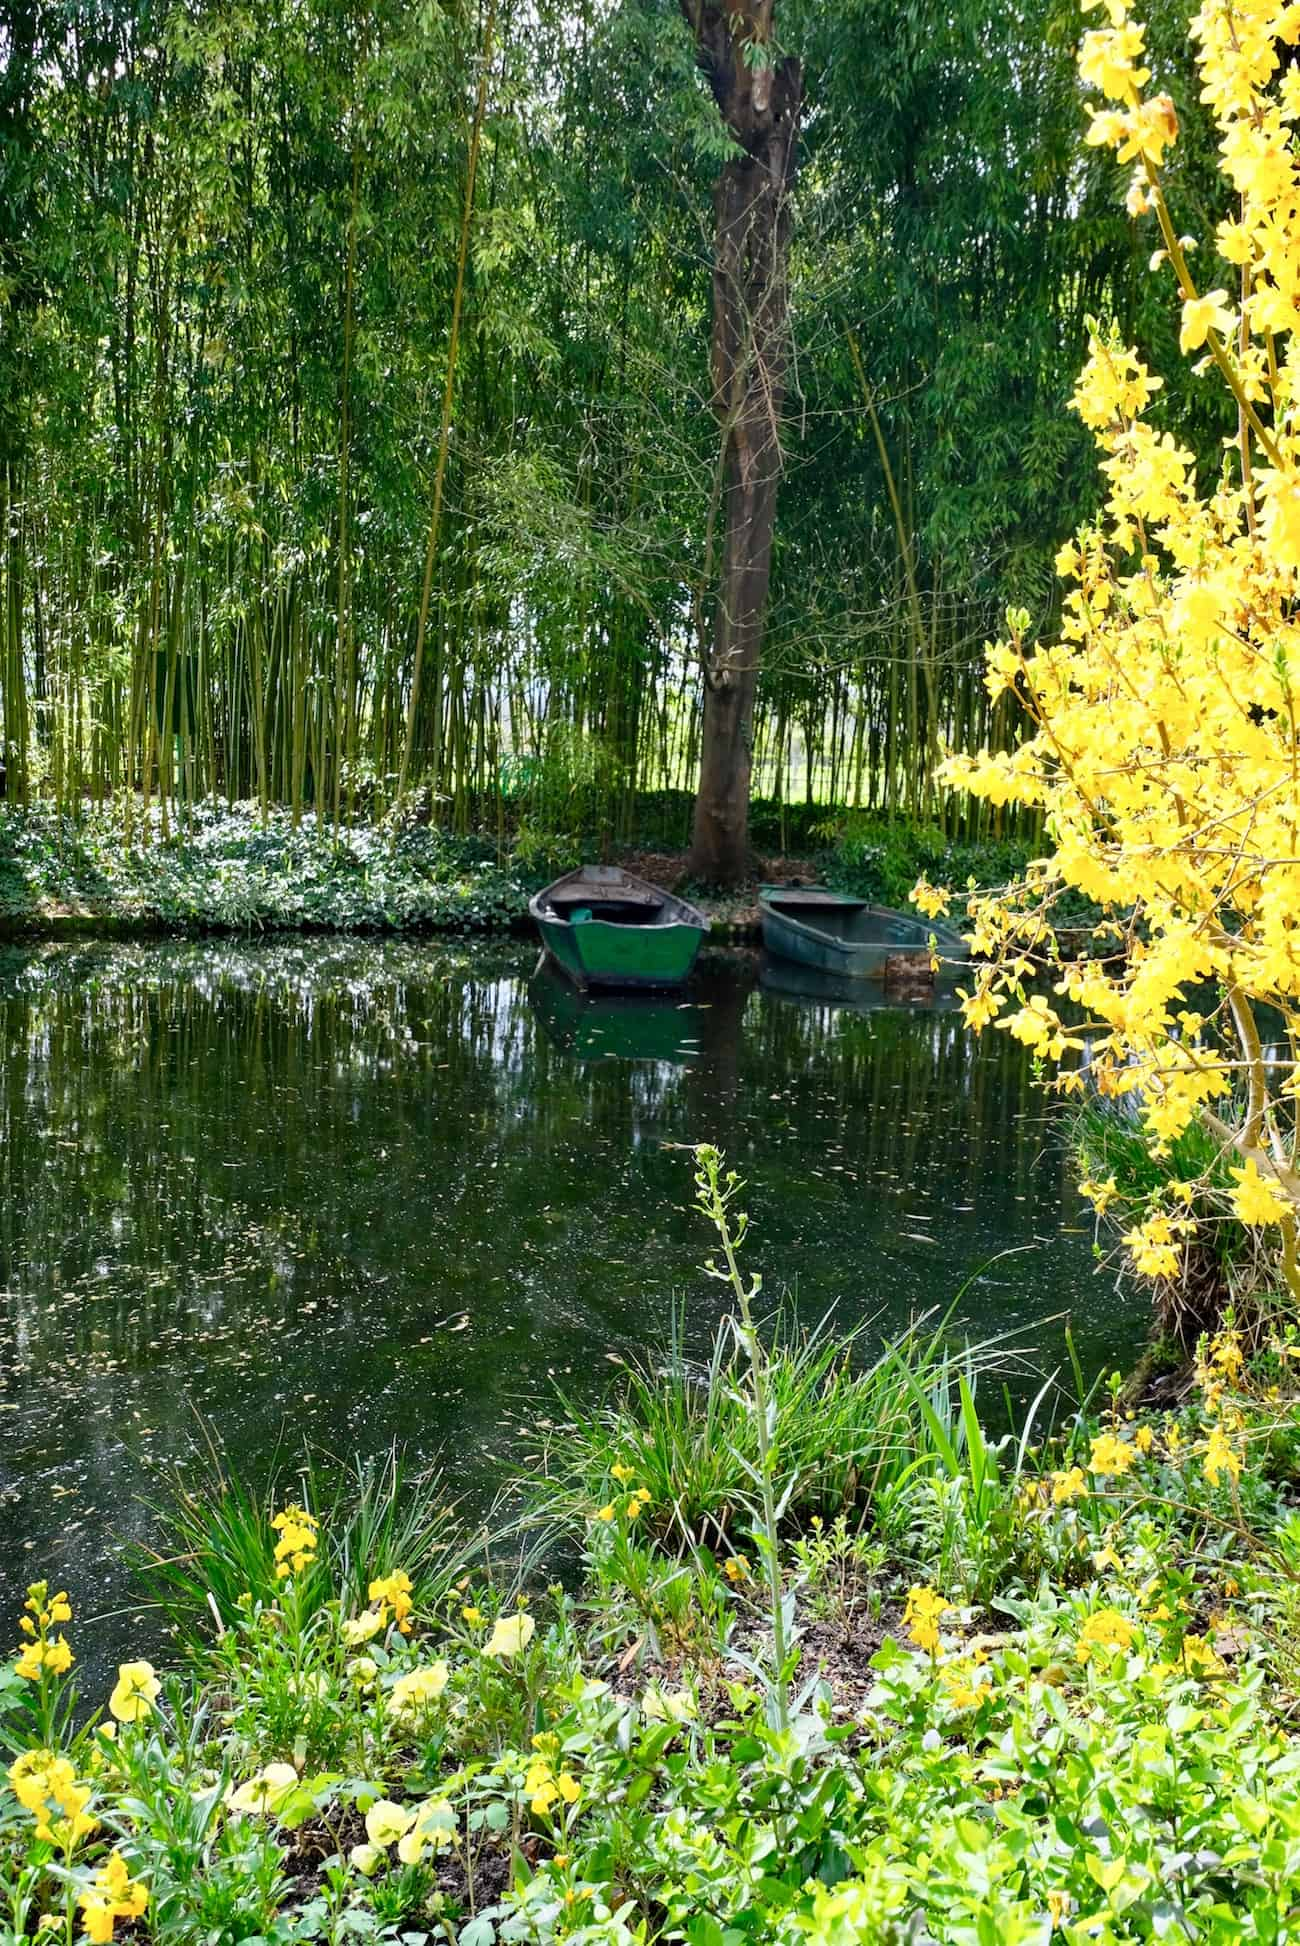 jardin-claude-monet-giverny